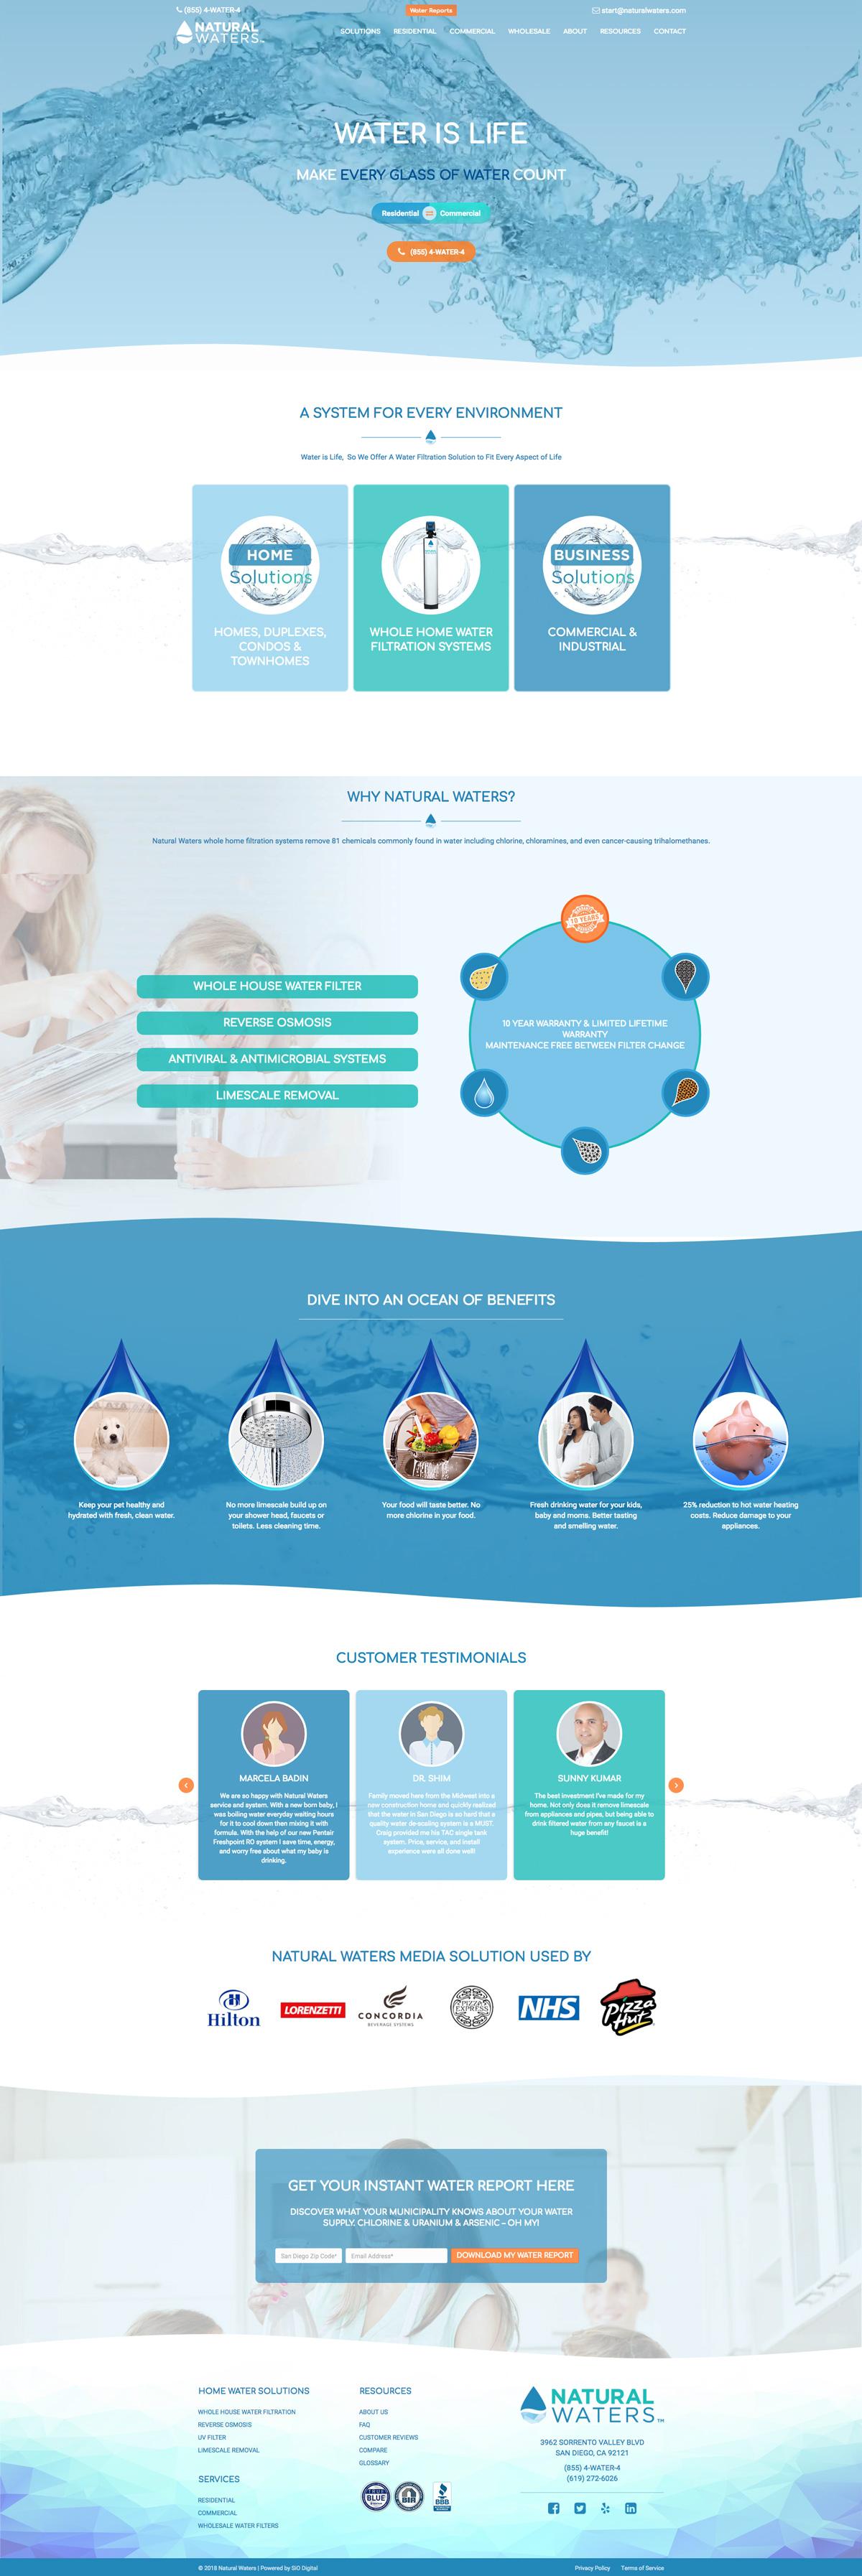 Website design agency san diego